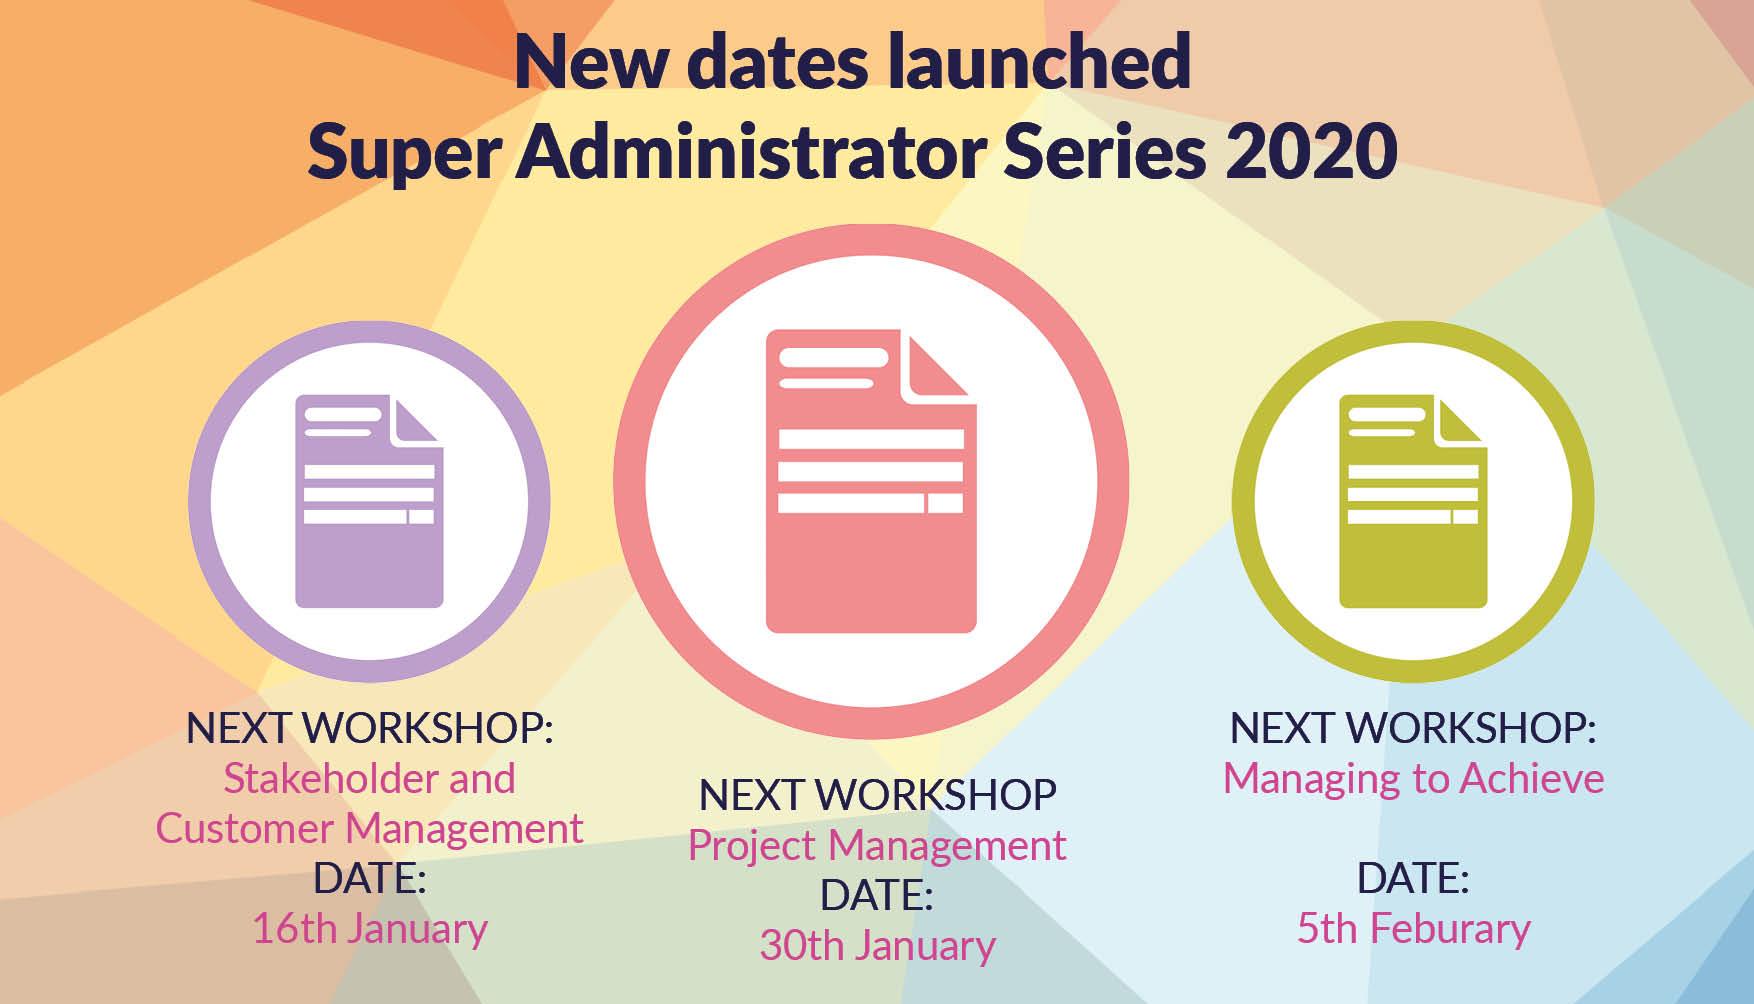 New SAS 2020 dates